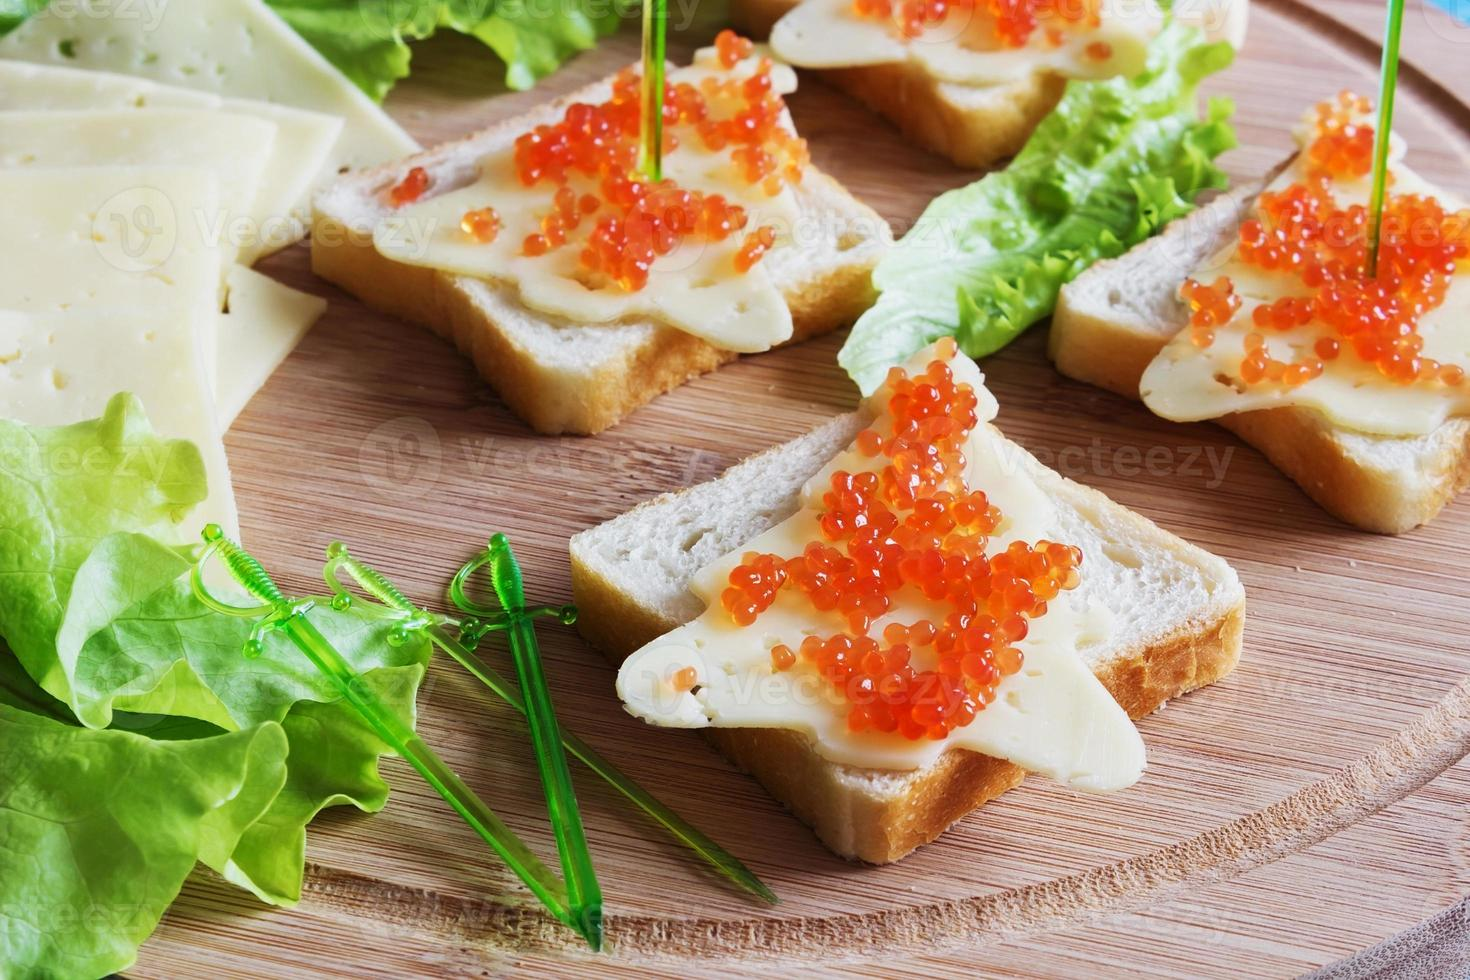 christmas sandwiches photo